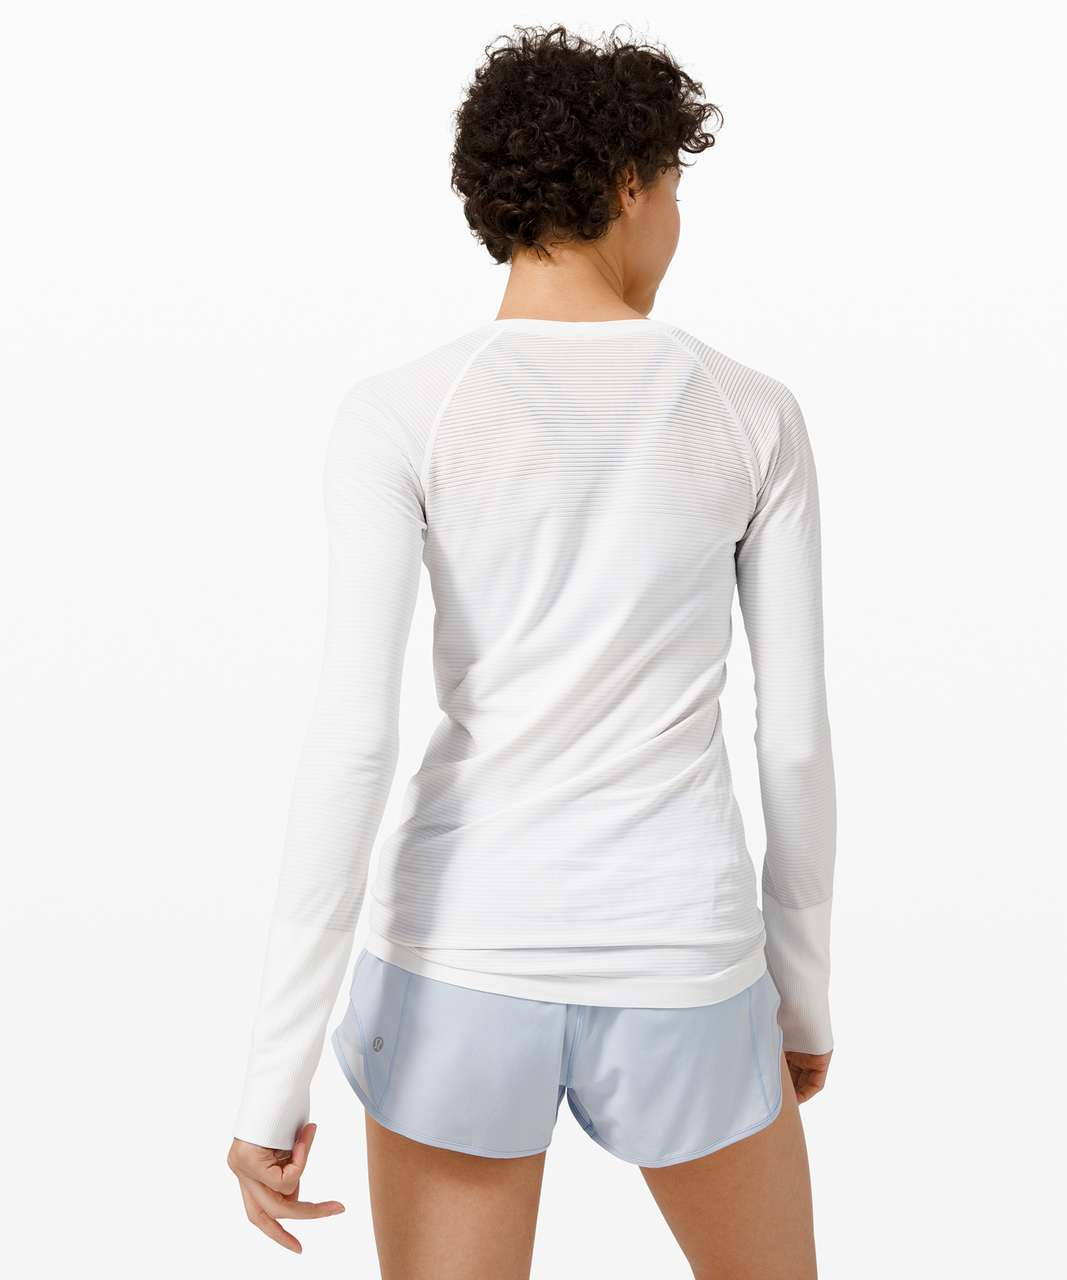 Lululemon Swiftly Tech Long Sleeve 2.0 - Colour Shift White / Blue